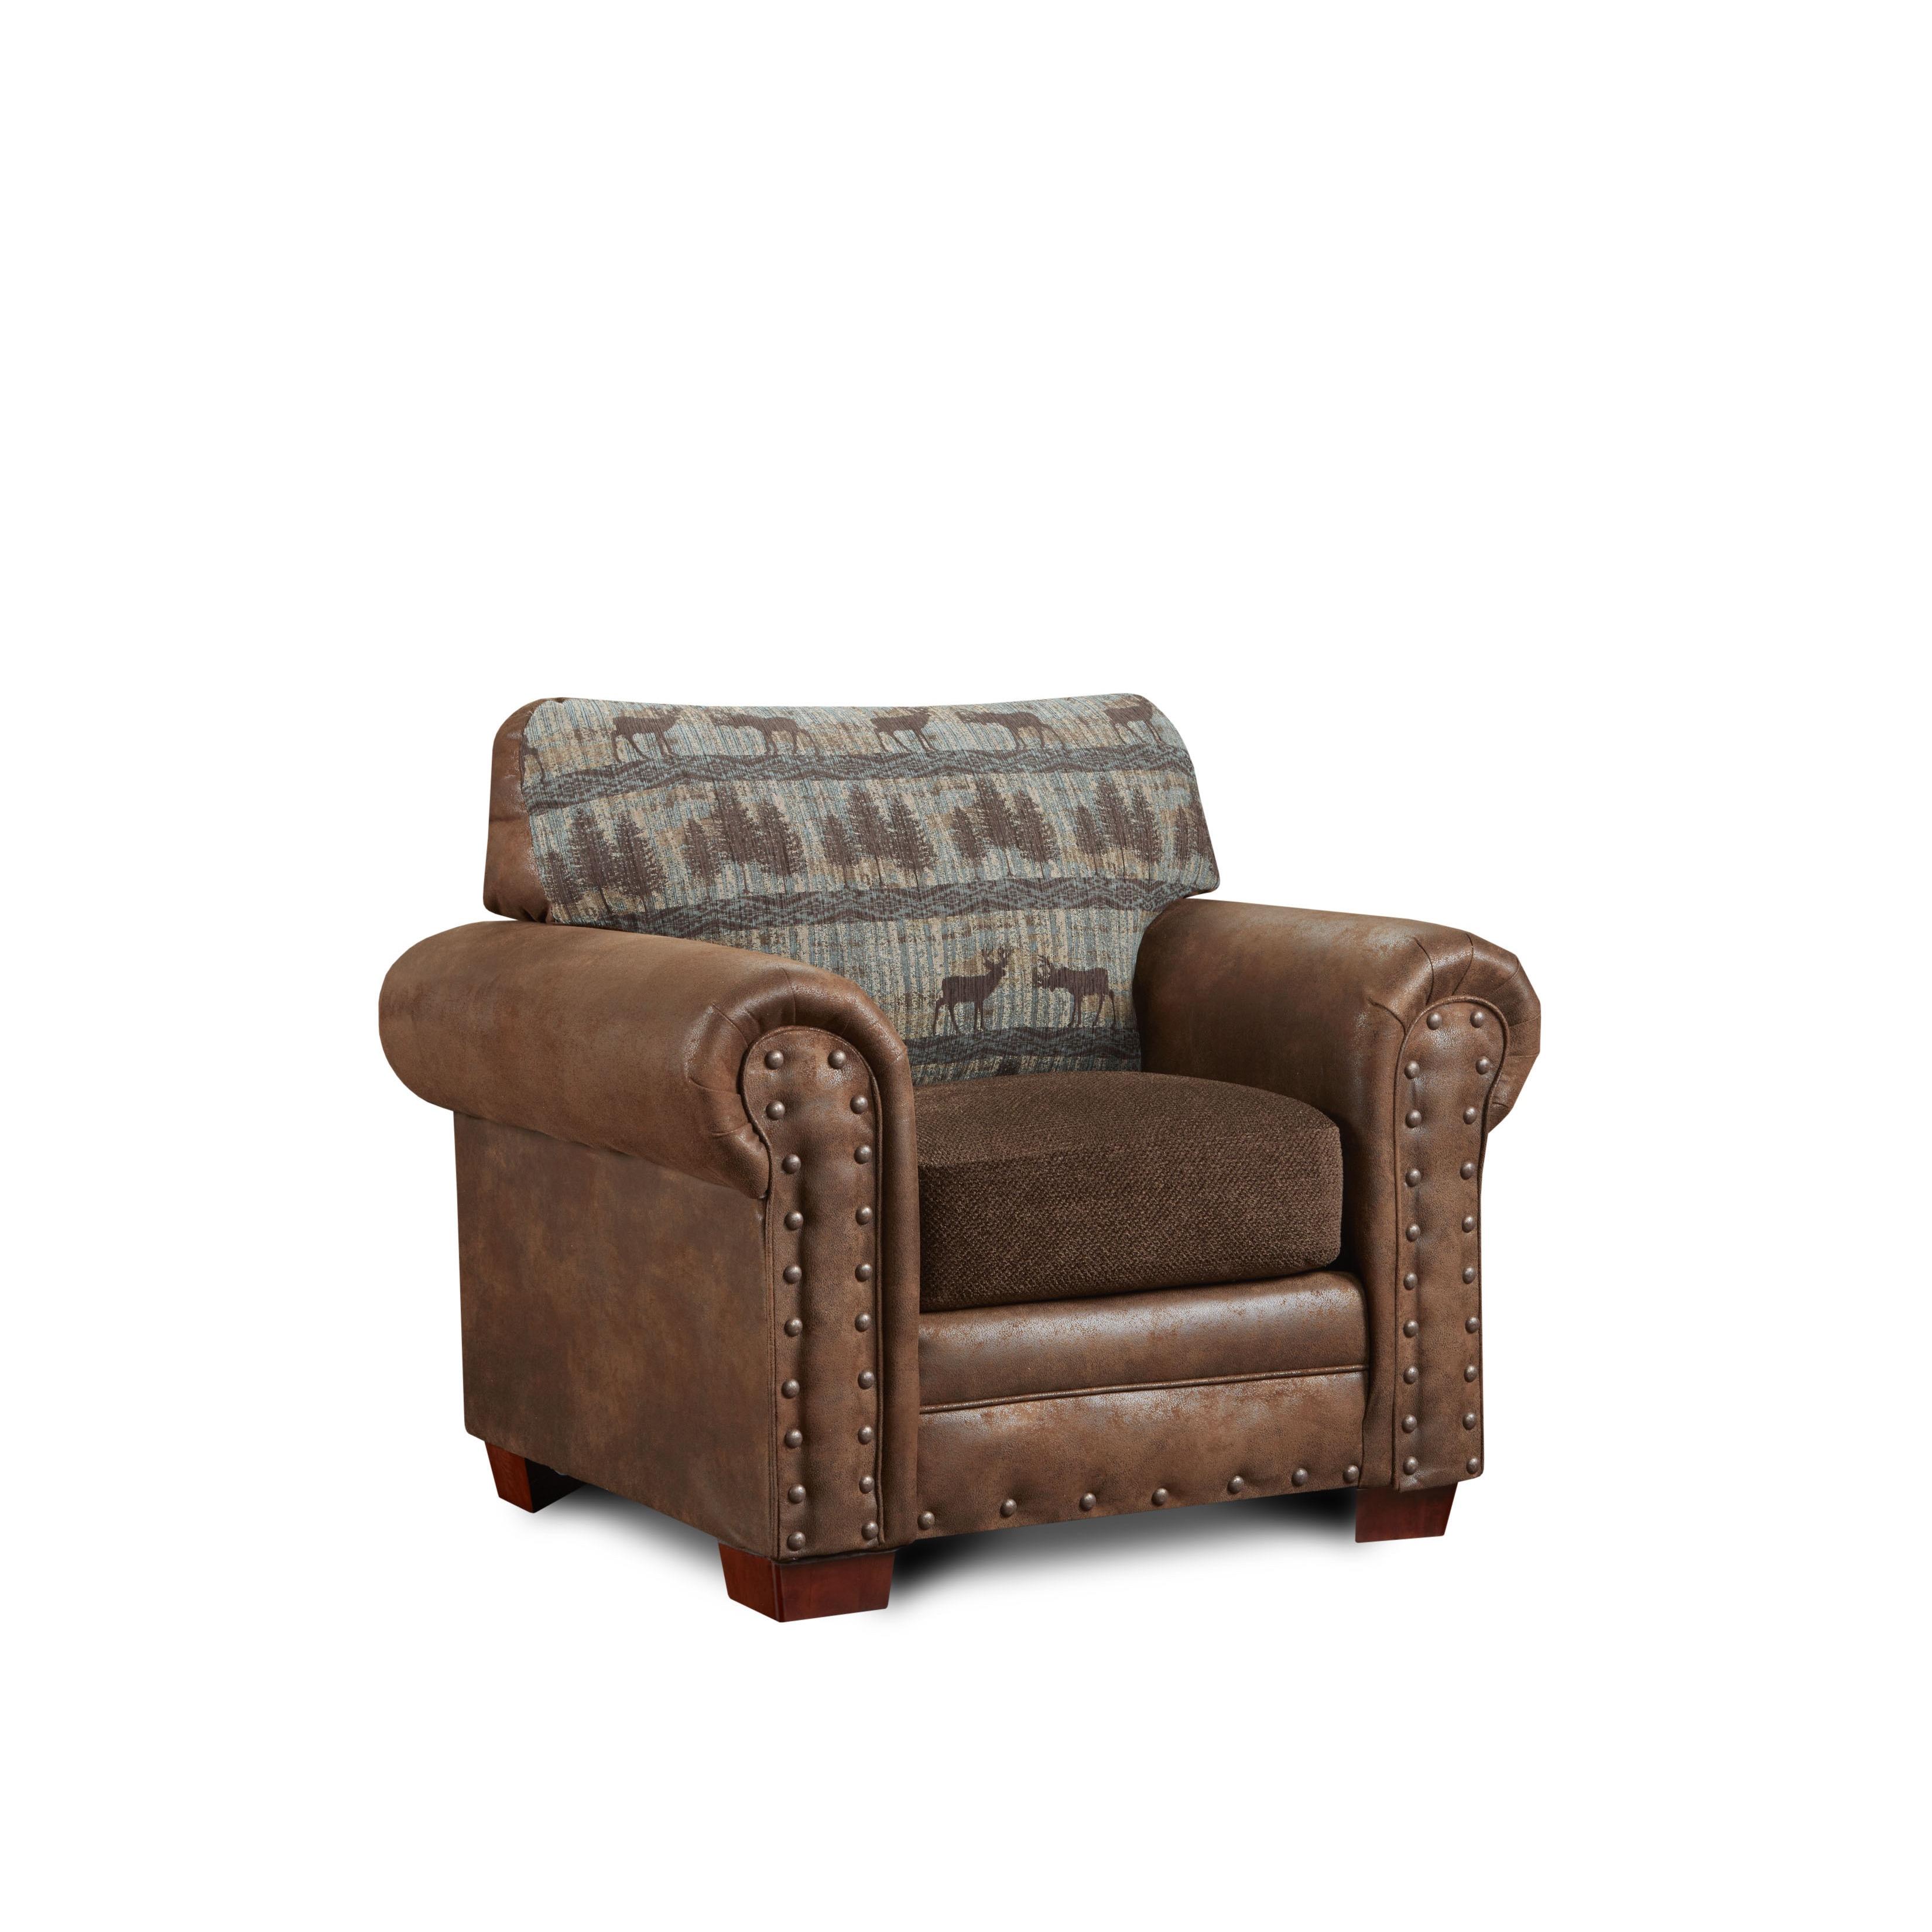 American Furniture Classics Deer Teal Tapestry Lodge Upho...